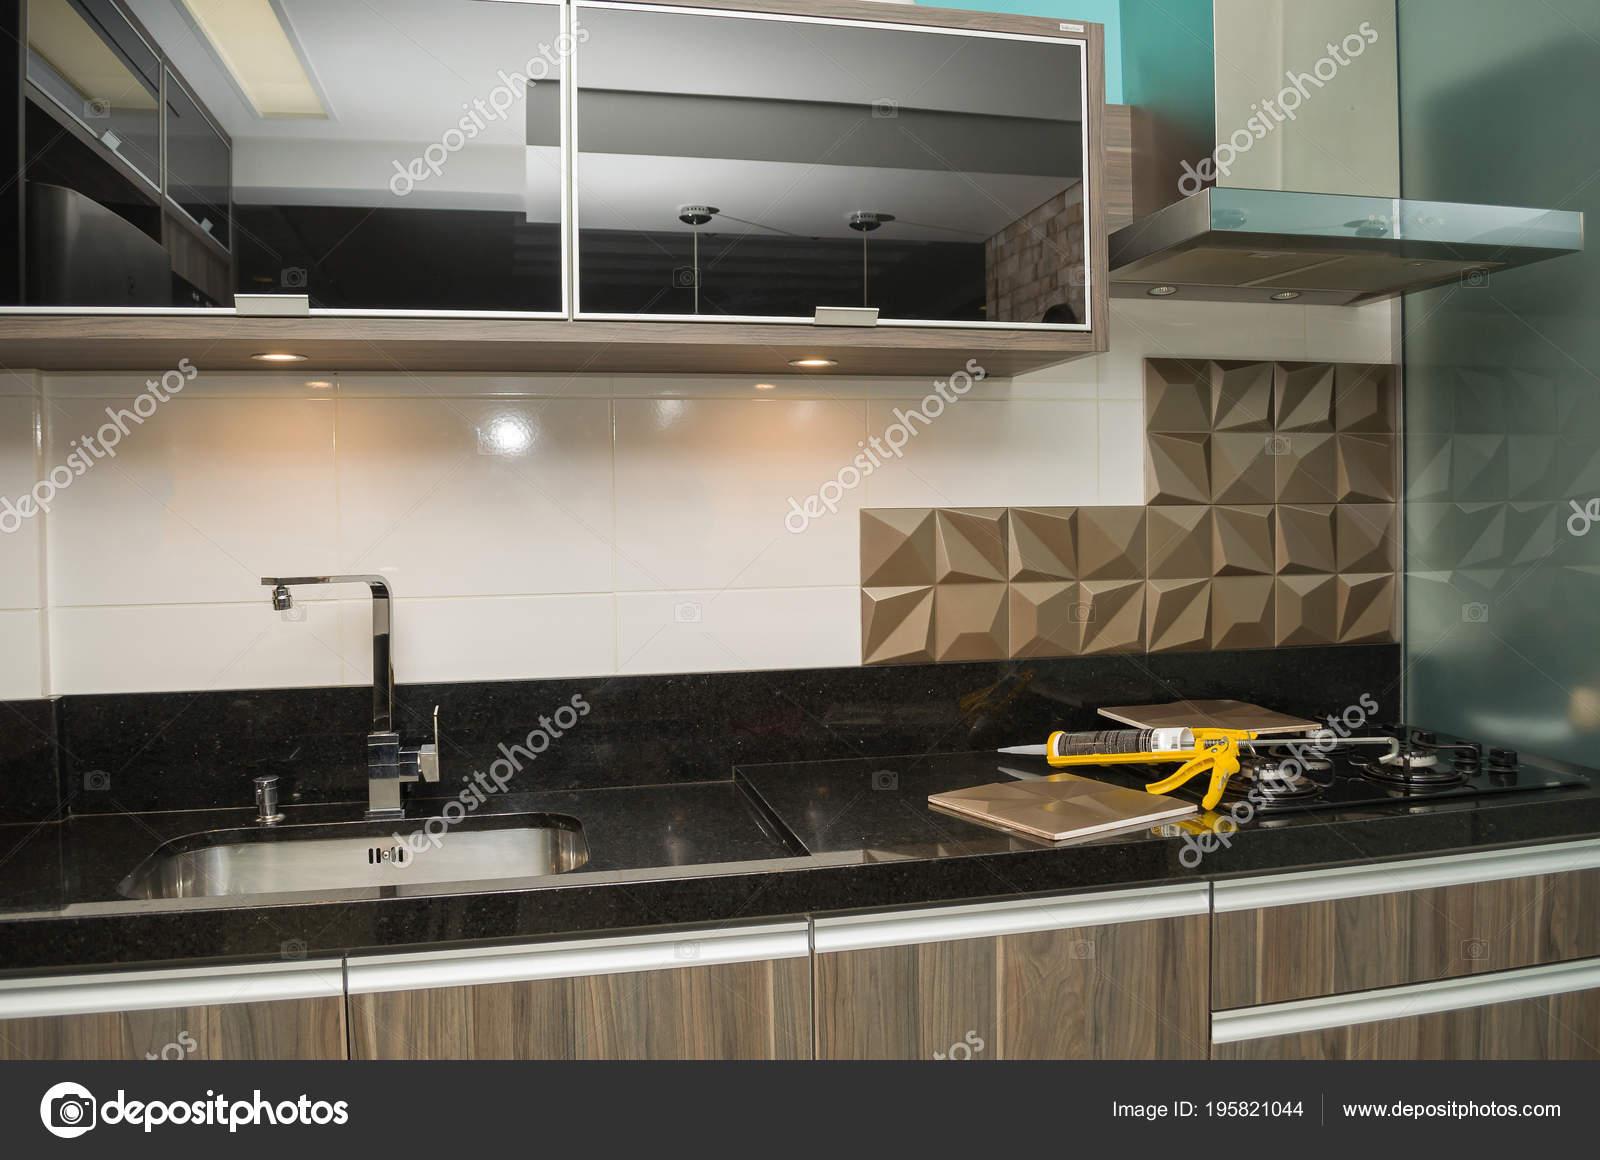 Renovating Kitchen Installing Tile Wall — Stock Photo ...